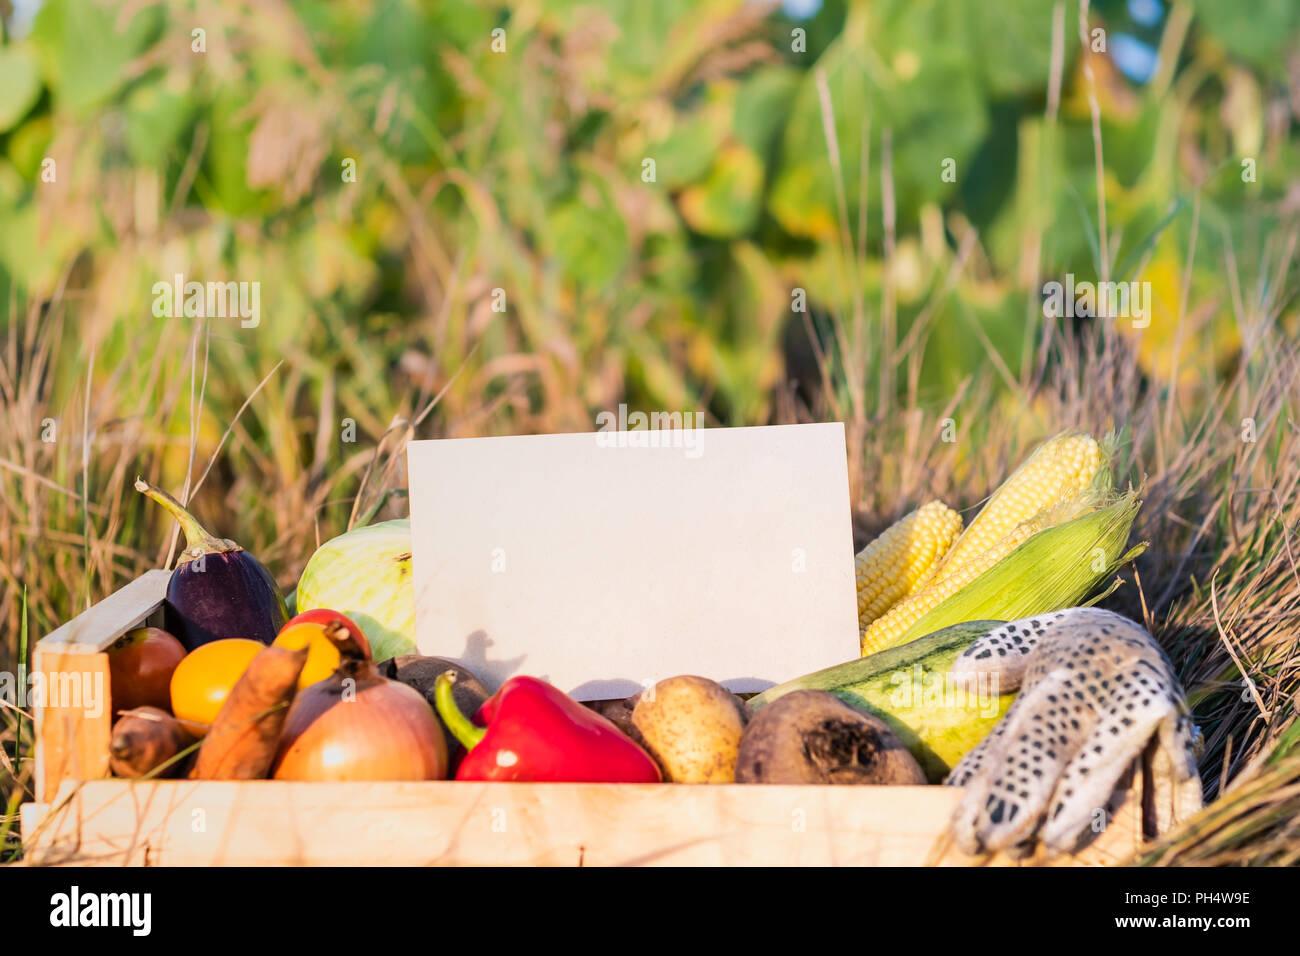 caja de embalaje lleno de hortalizas org nicas naturales signo rh alamy es